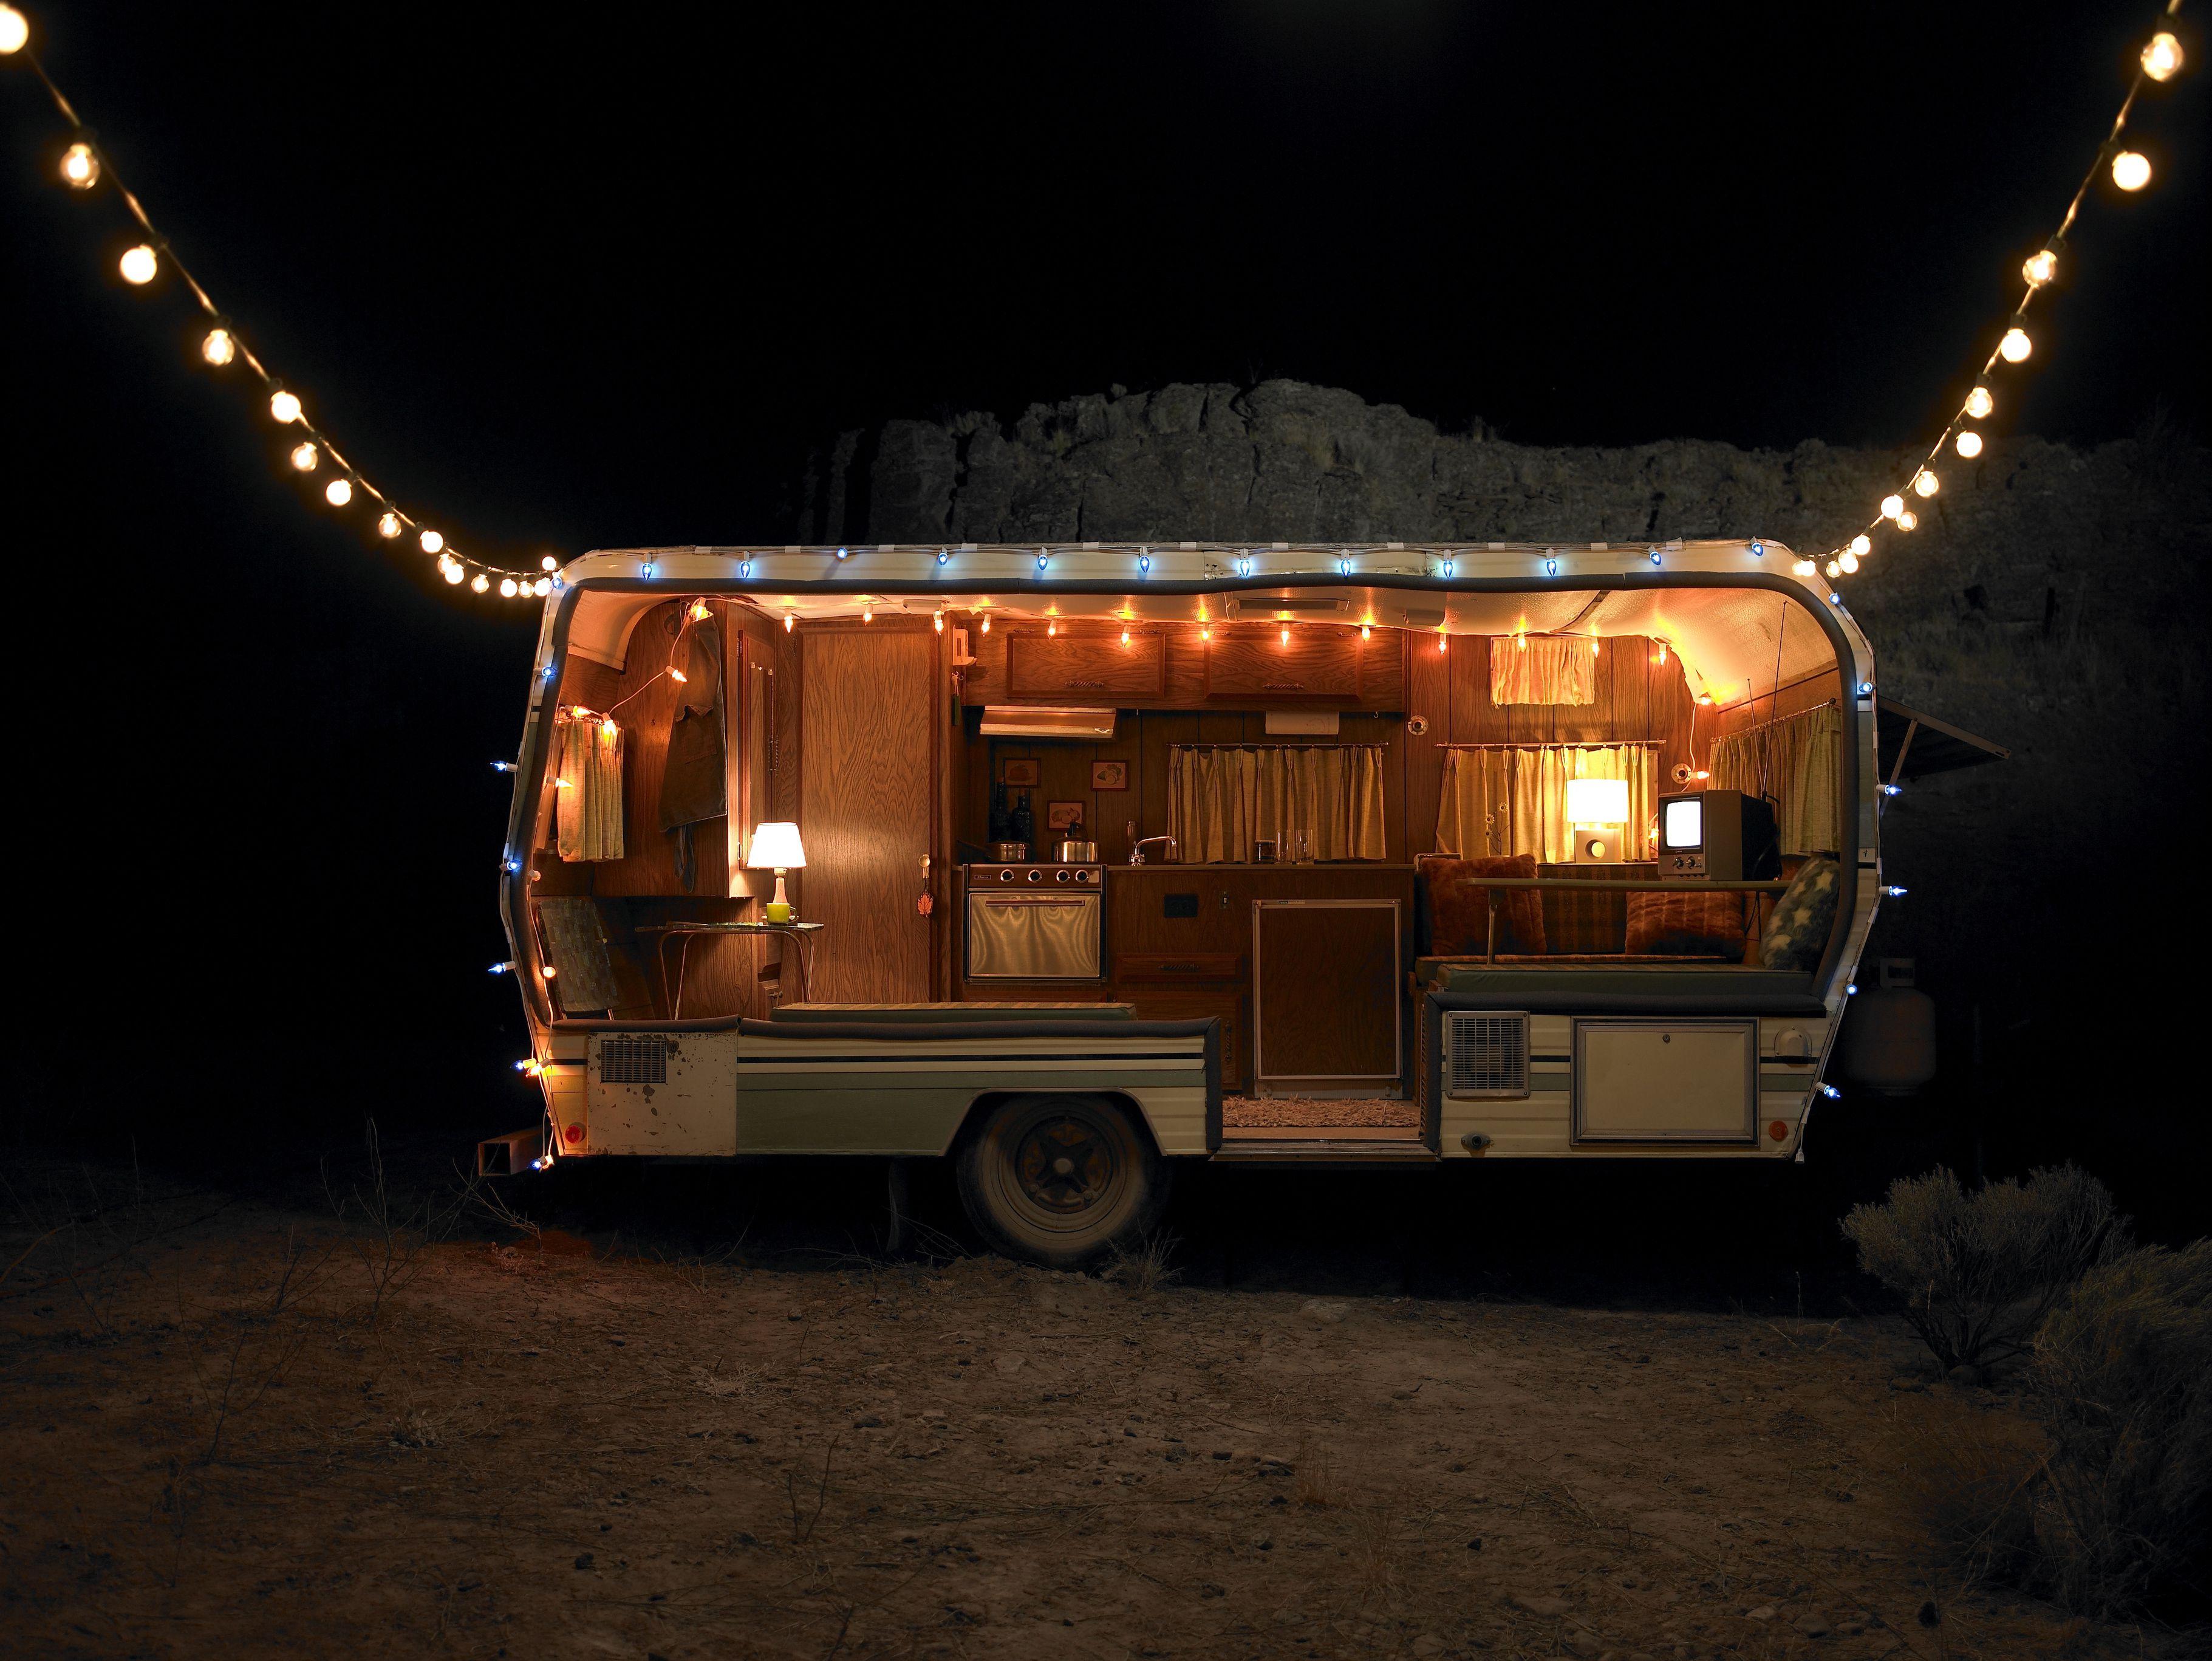 Top 5 Camper Rvs Money Can Buy